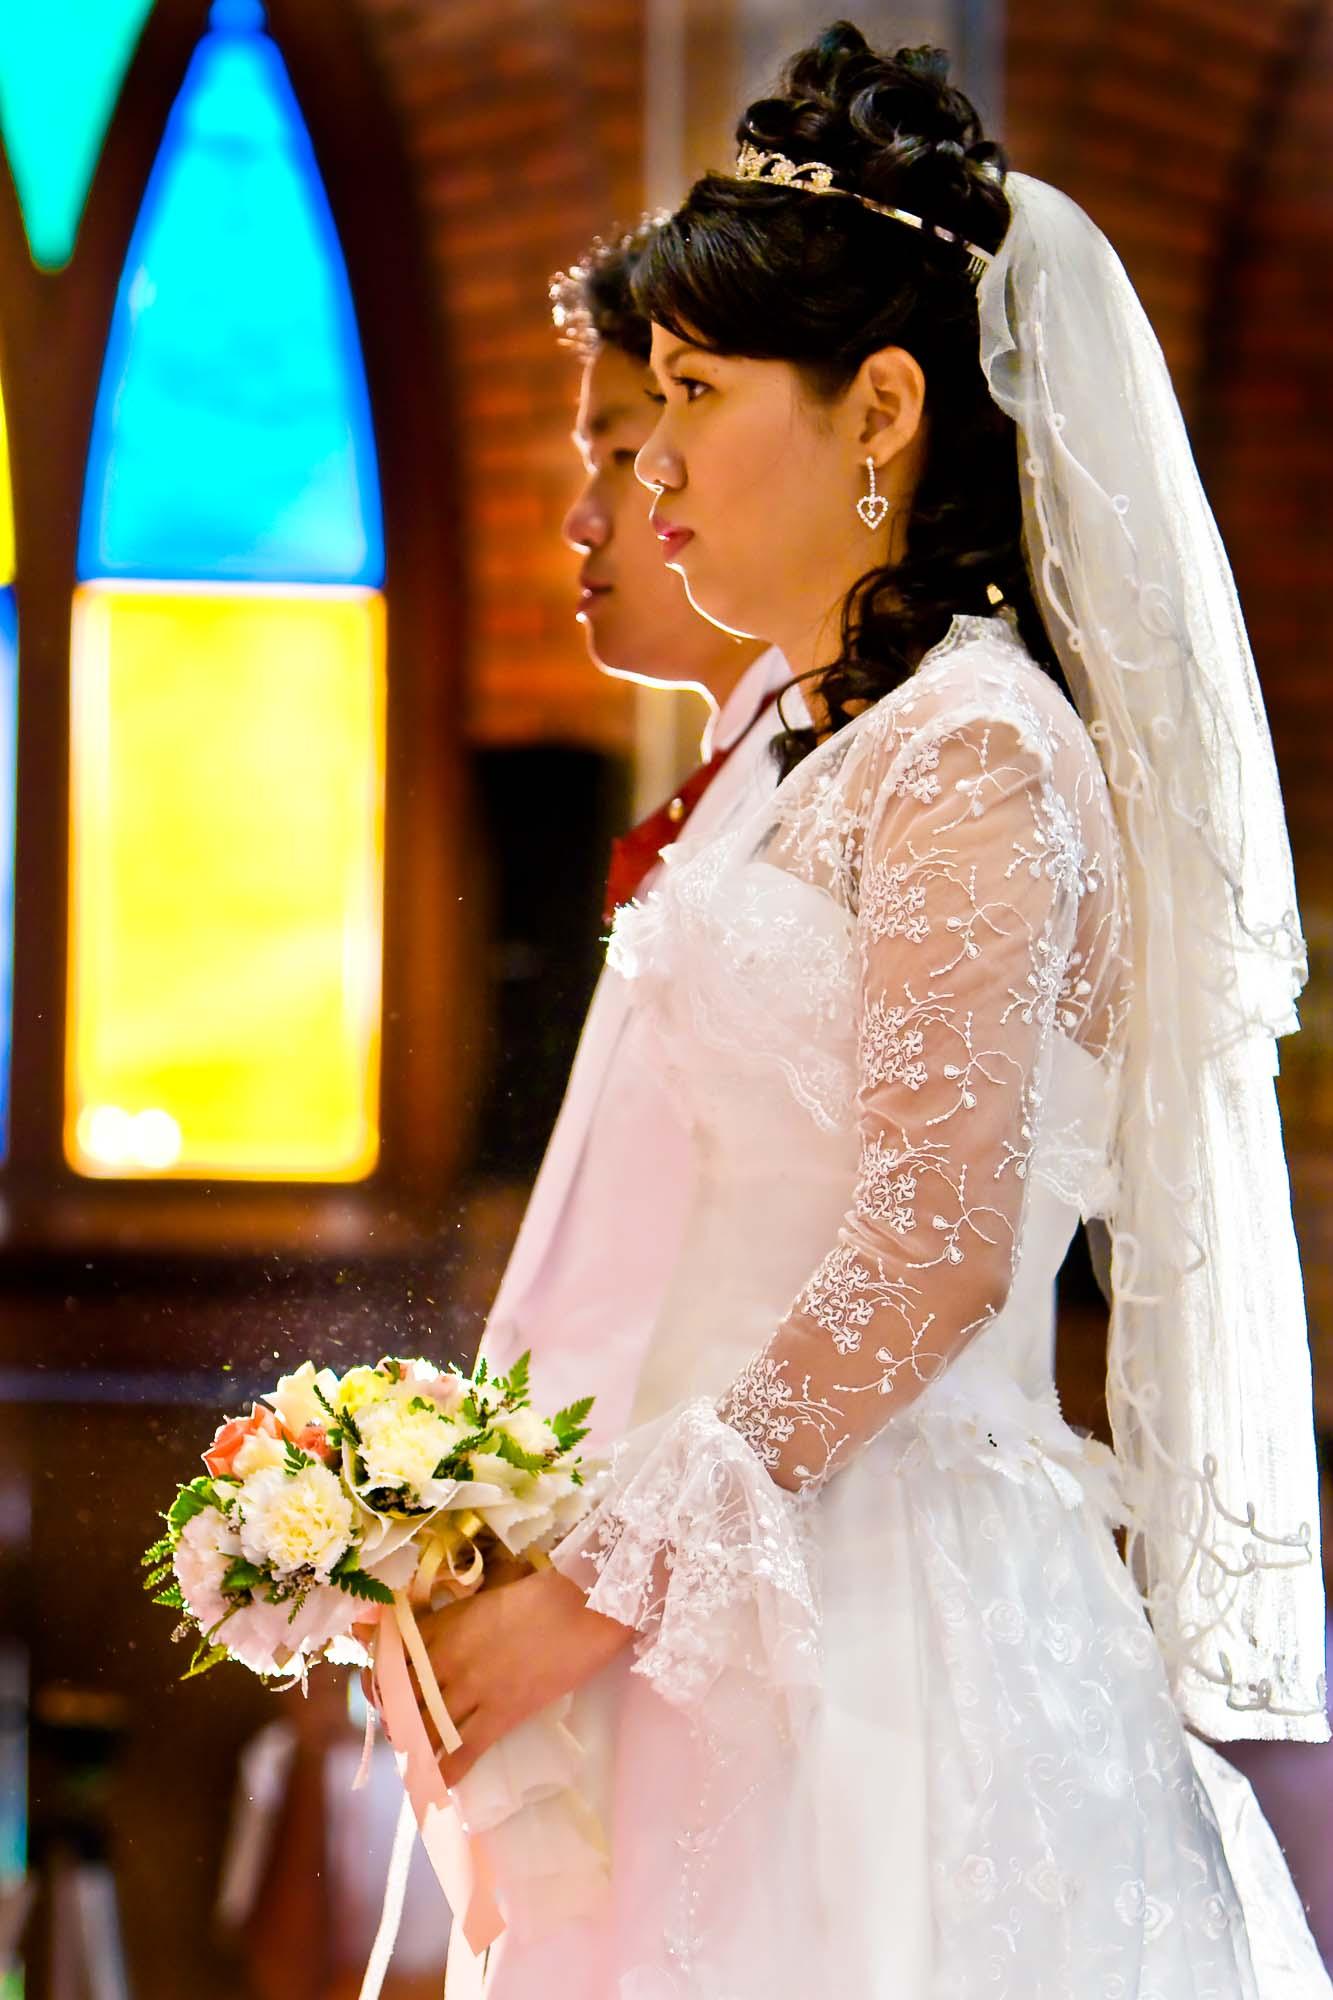 Wedding at Saint John's Church in Bangkok Thailand | Bangkok Wedding Photography